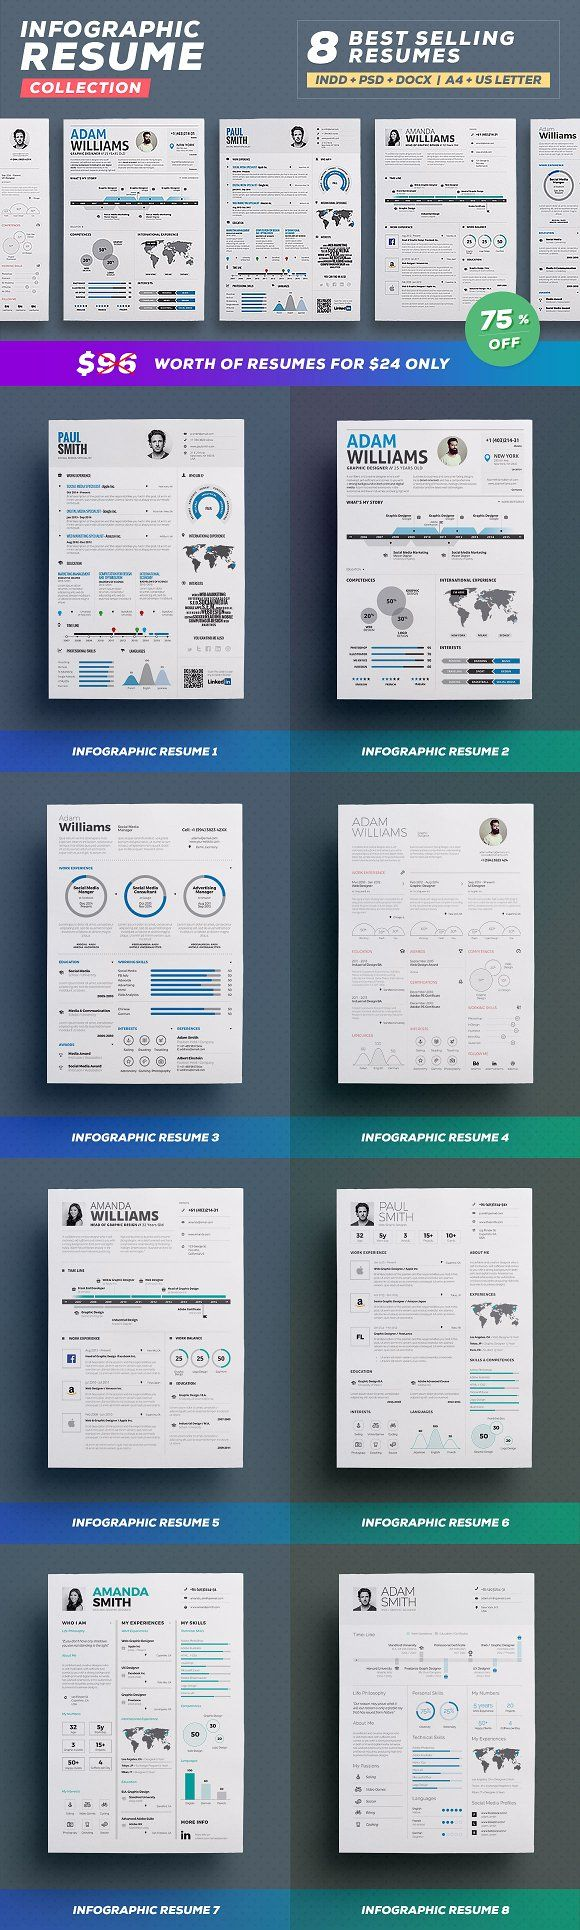 infographic resume bundle - Infographic Resume Builder